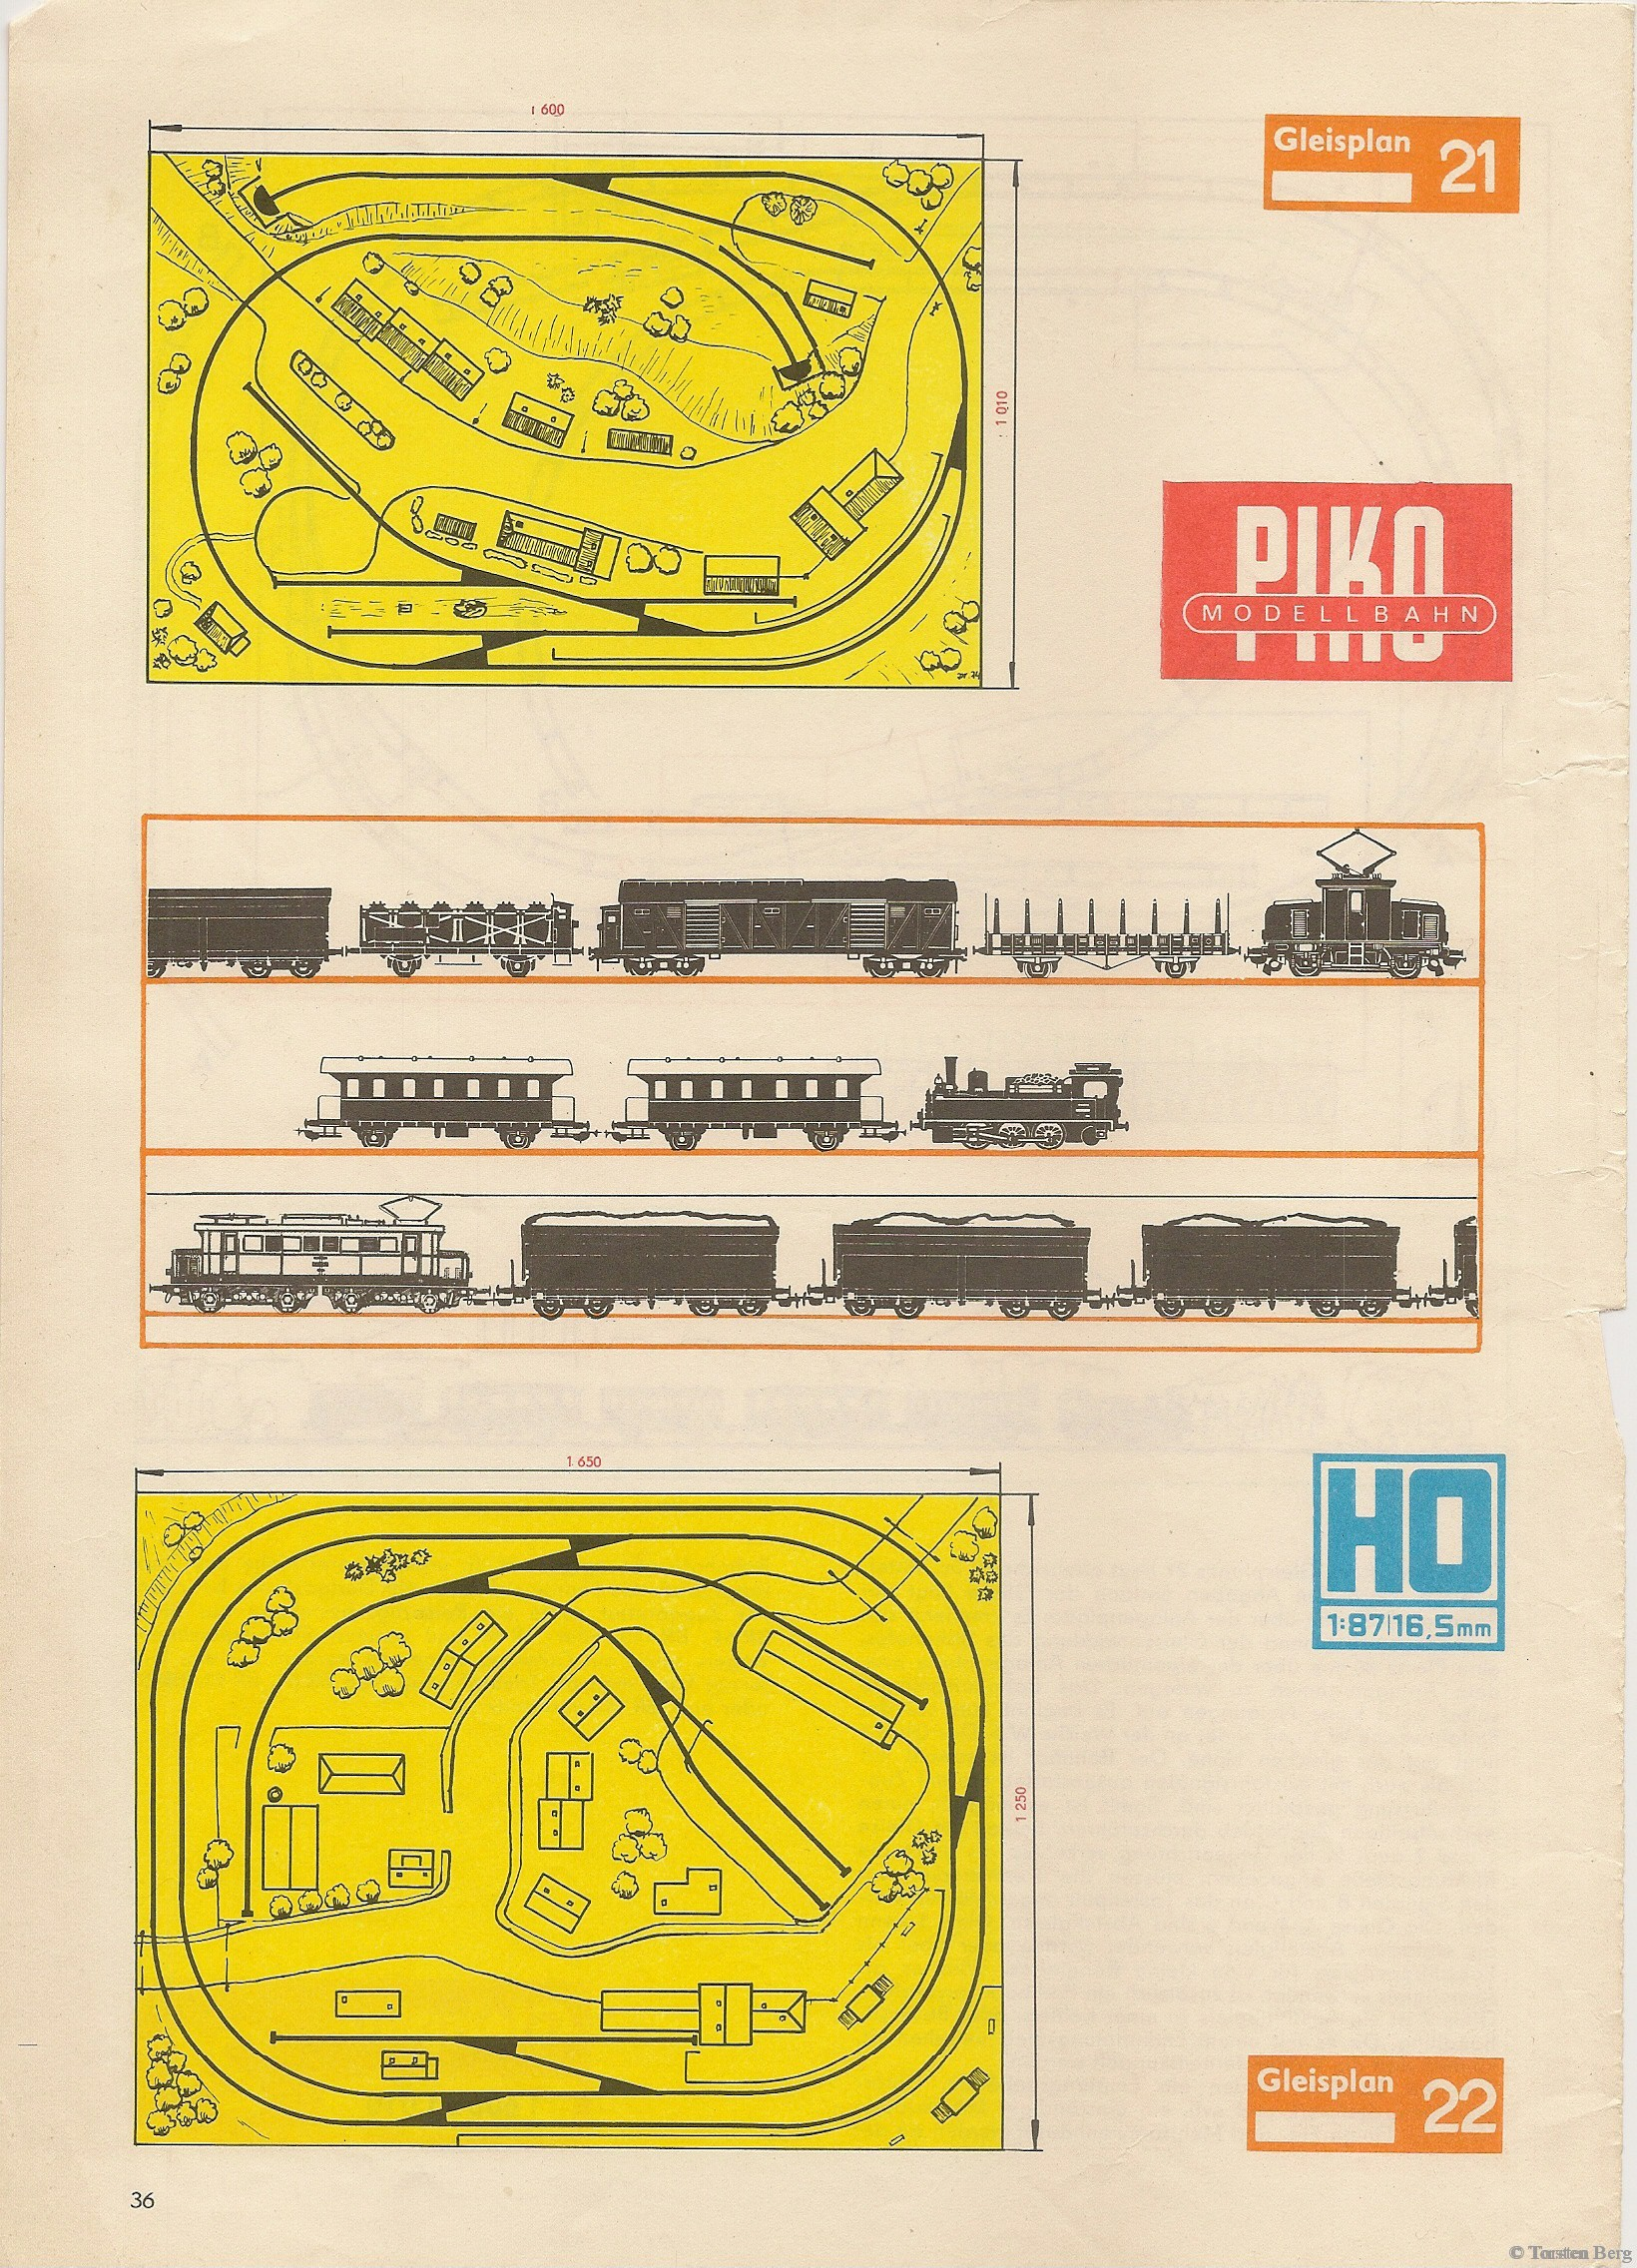 37 PIKO Standardgleis-Gleisplan 21-22